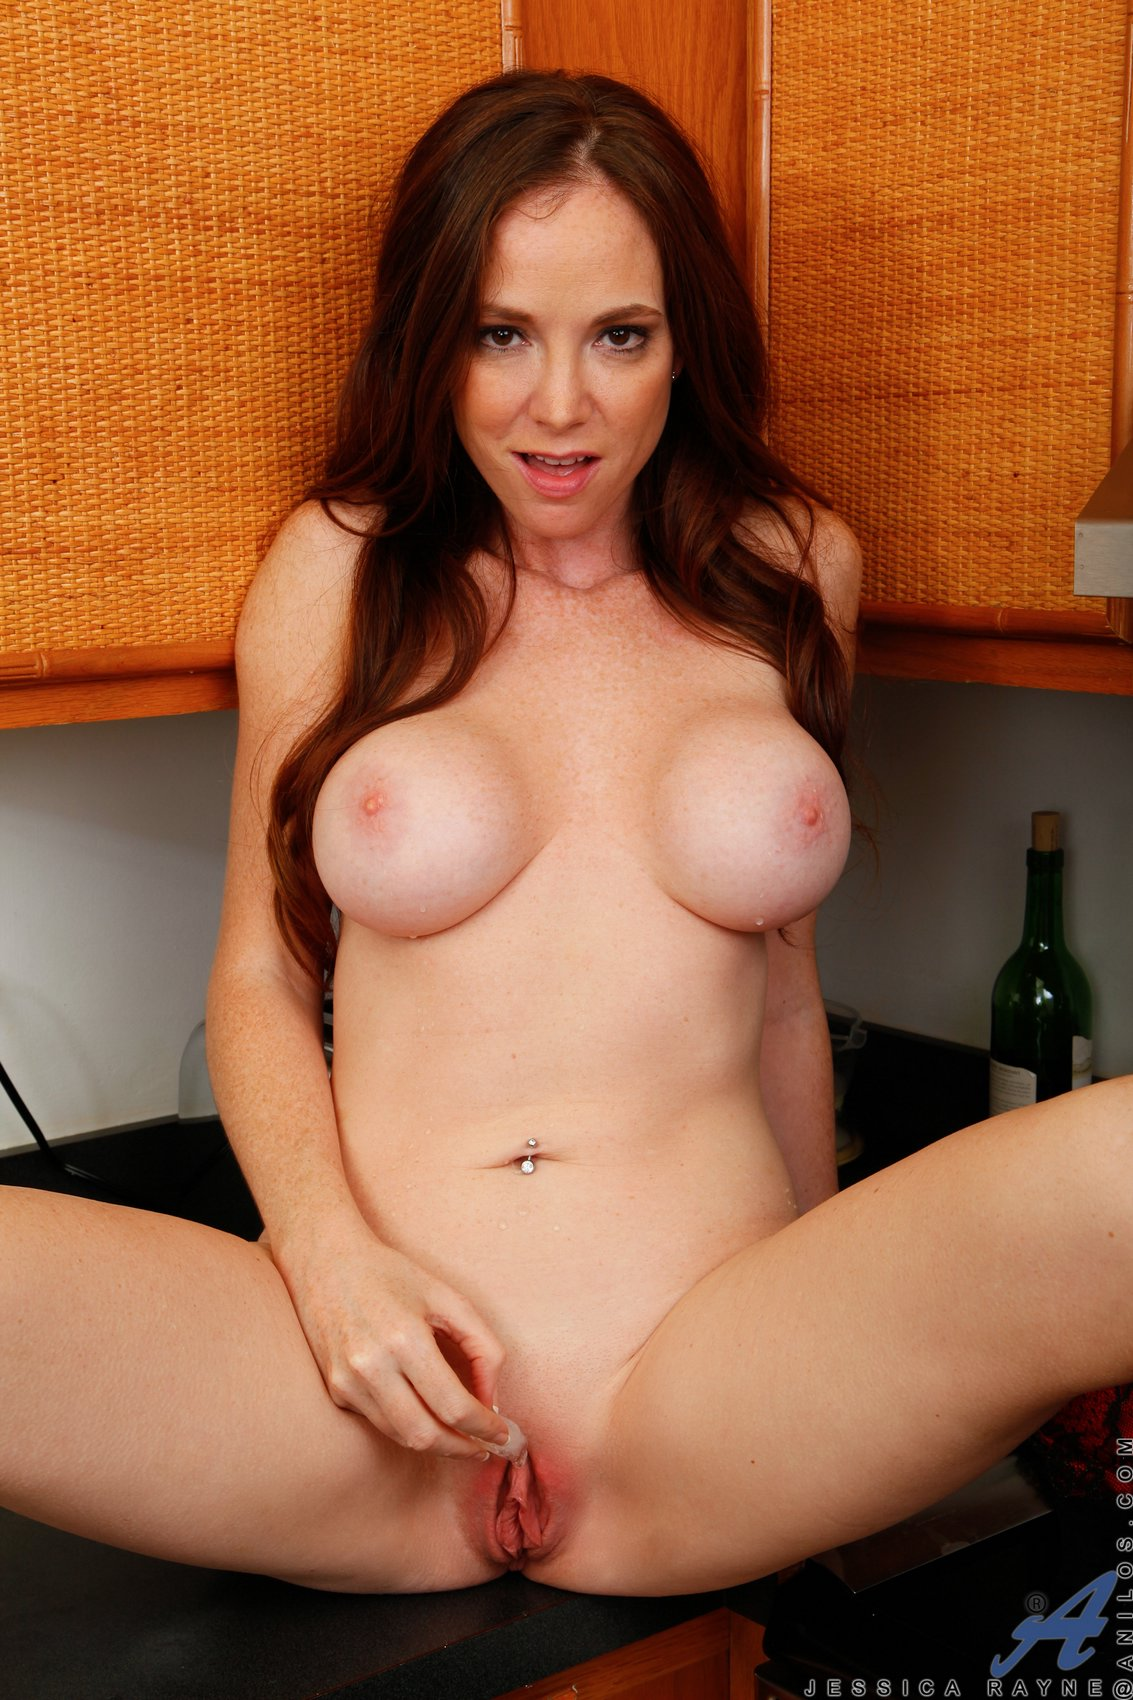 spanish girl in panties naked